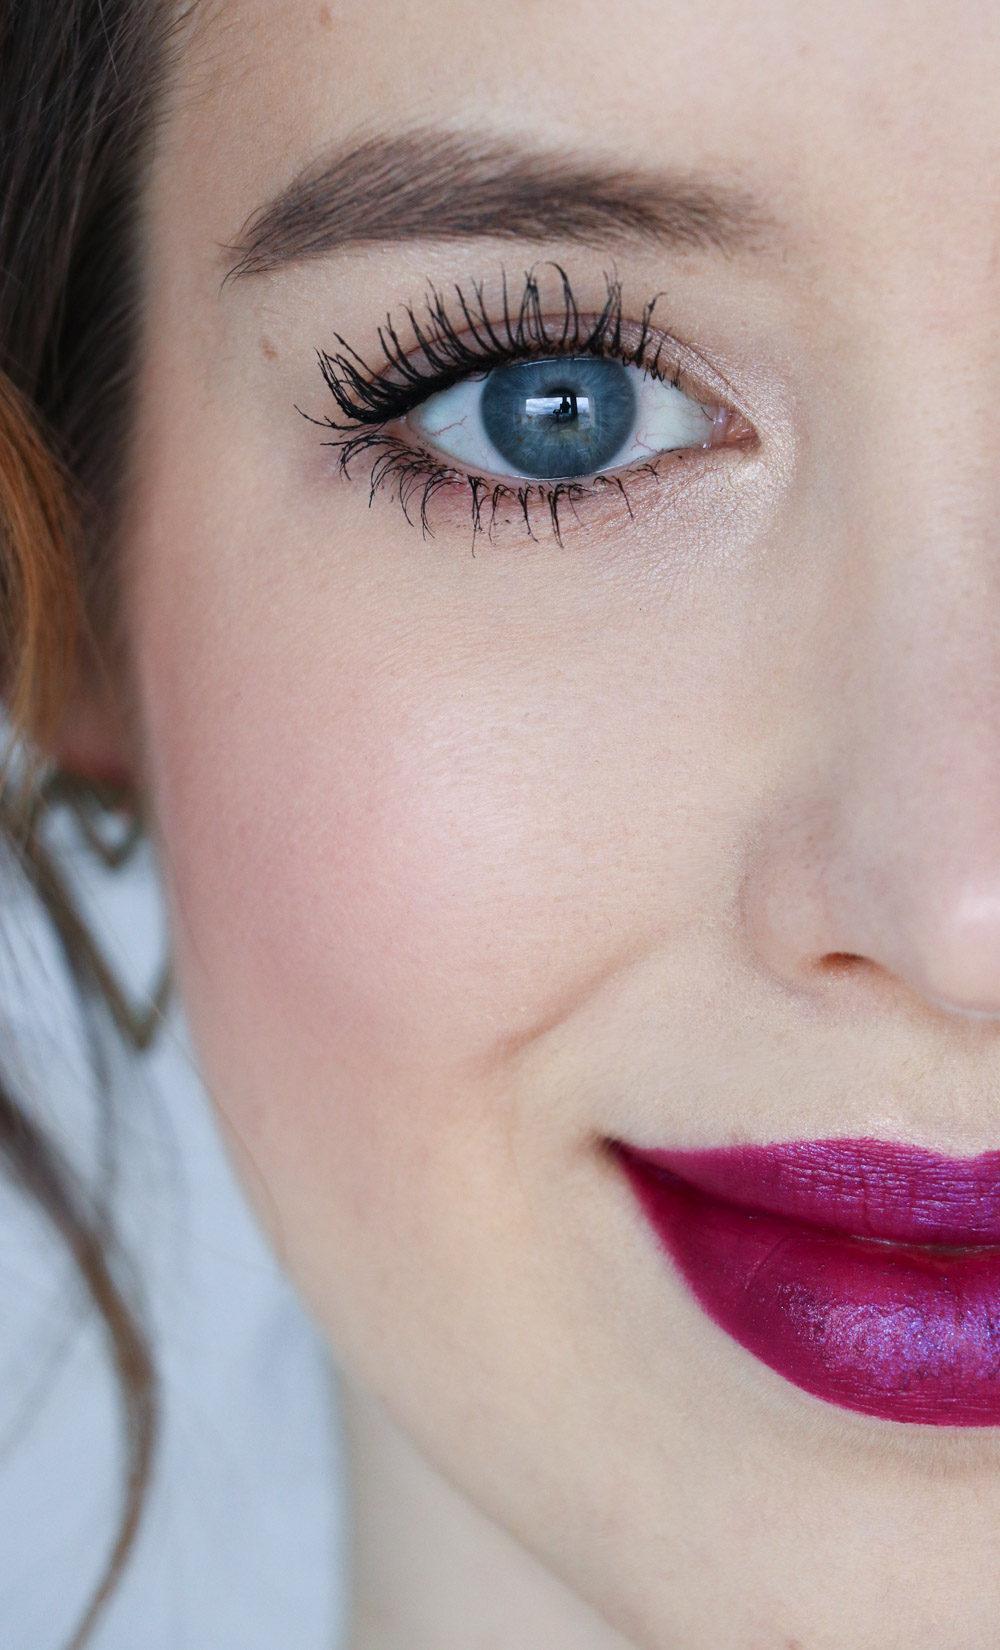 d0be26fec36 Zoeva Graphic Lash Mascara Review - Cream's Beauty Blog